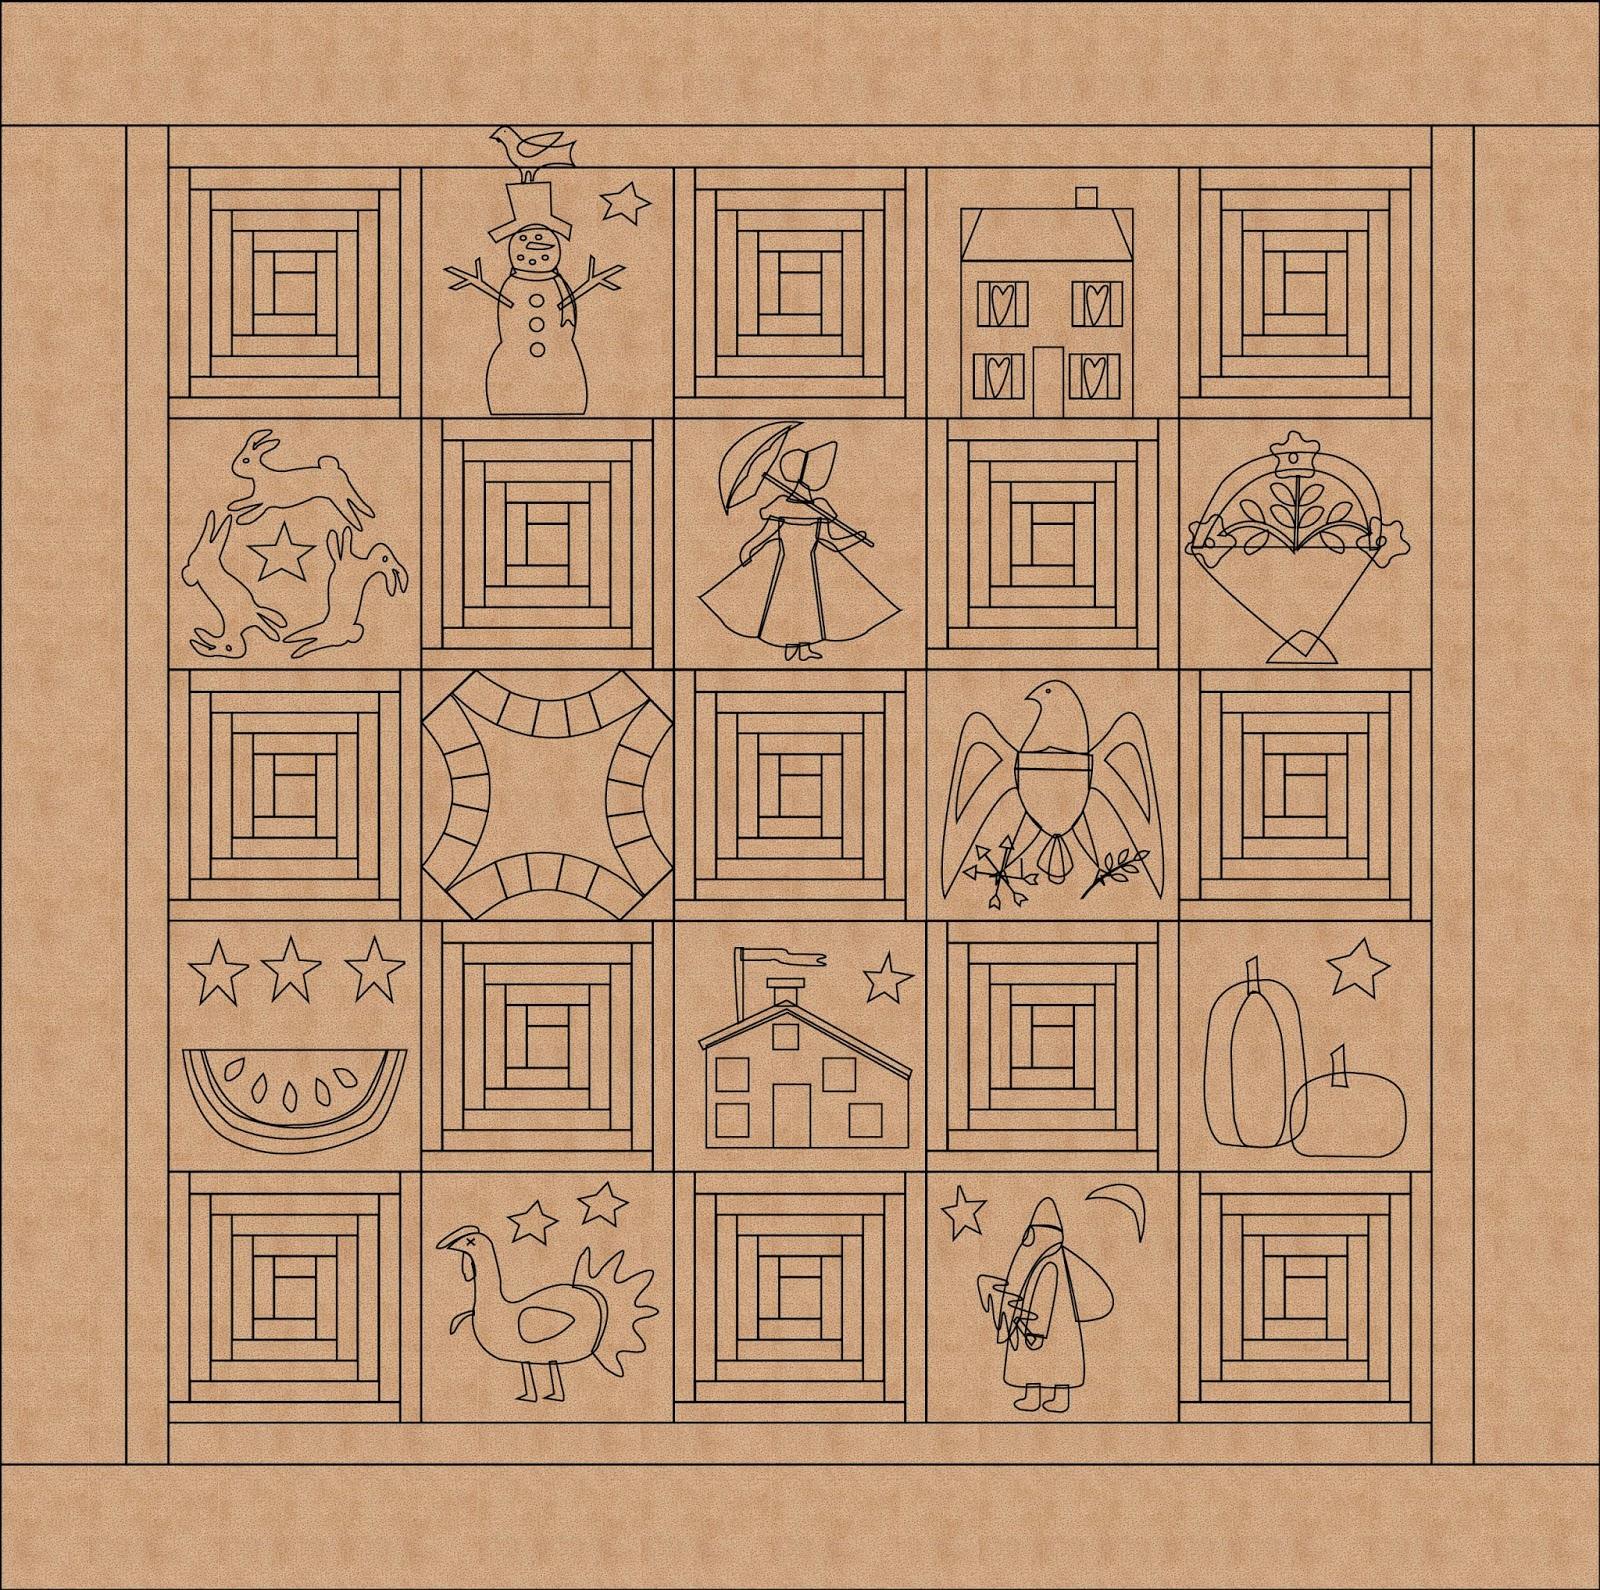 http://4.bp.blogspot.com/-RB6bOdD6PUg/Ux3rsXi_AXI/AAAAAAAAE-8/56n-e0lUojE/s1600/Drawing+tan.jpg